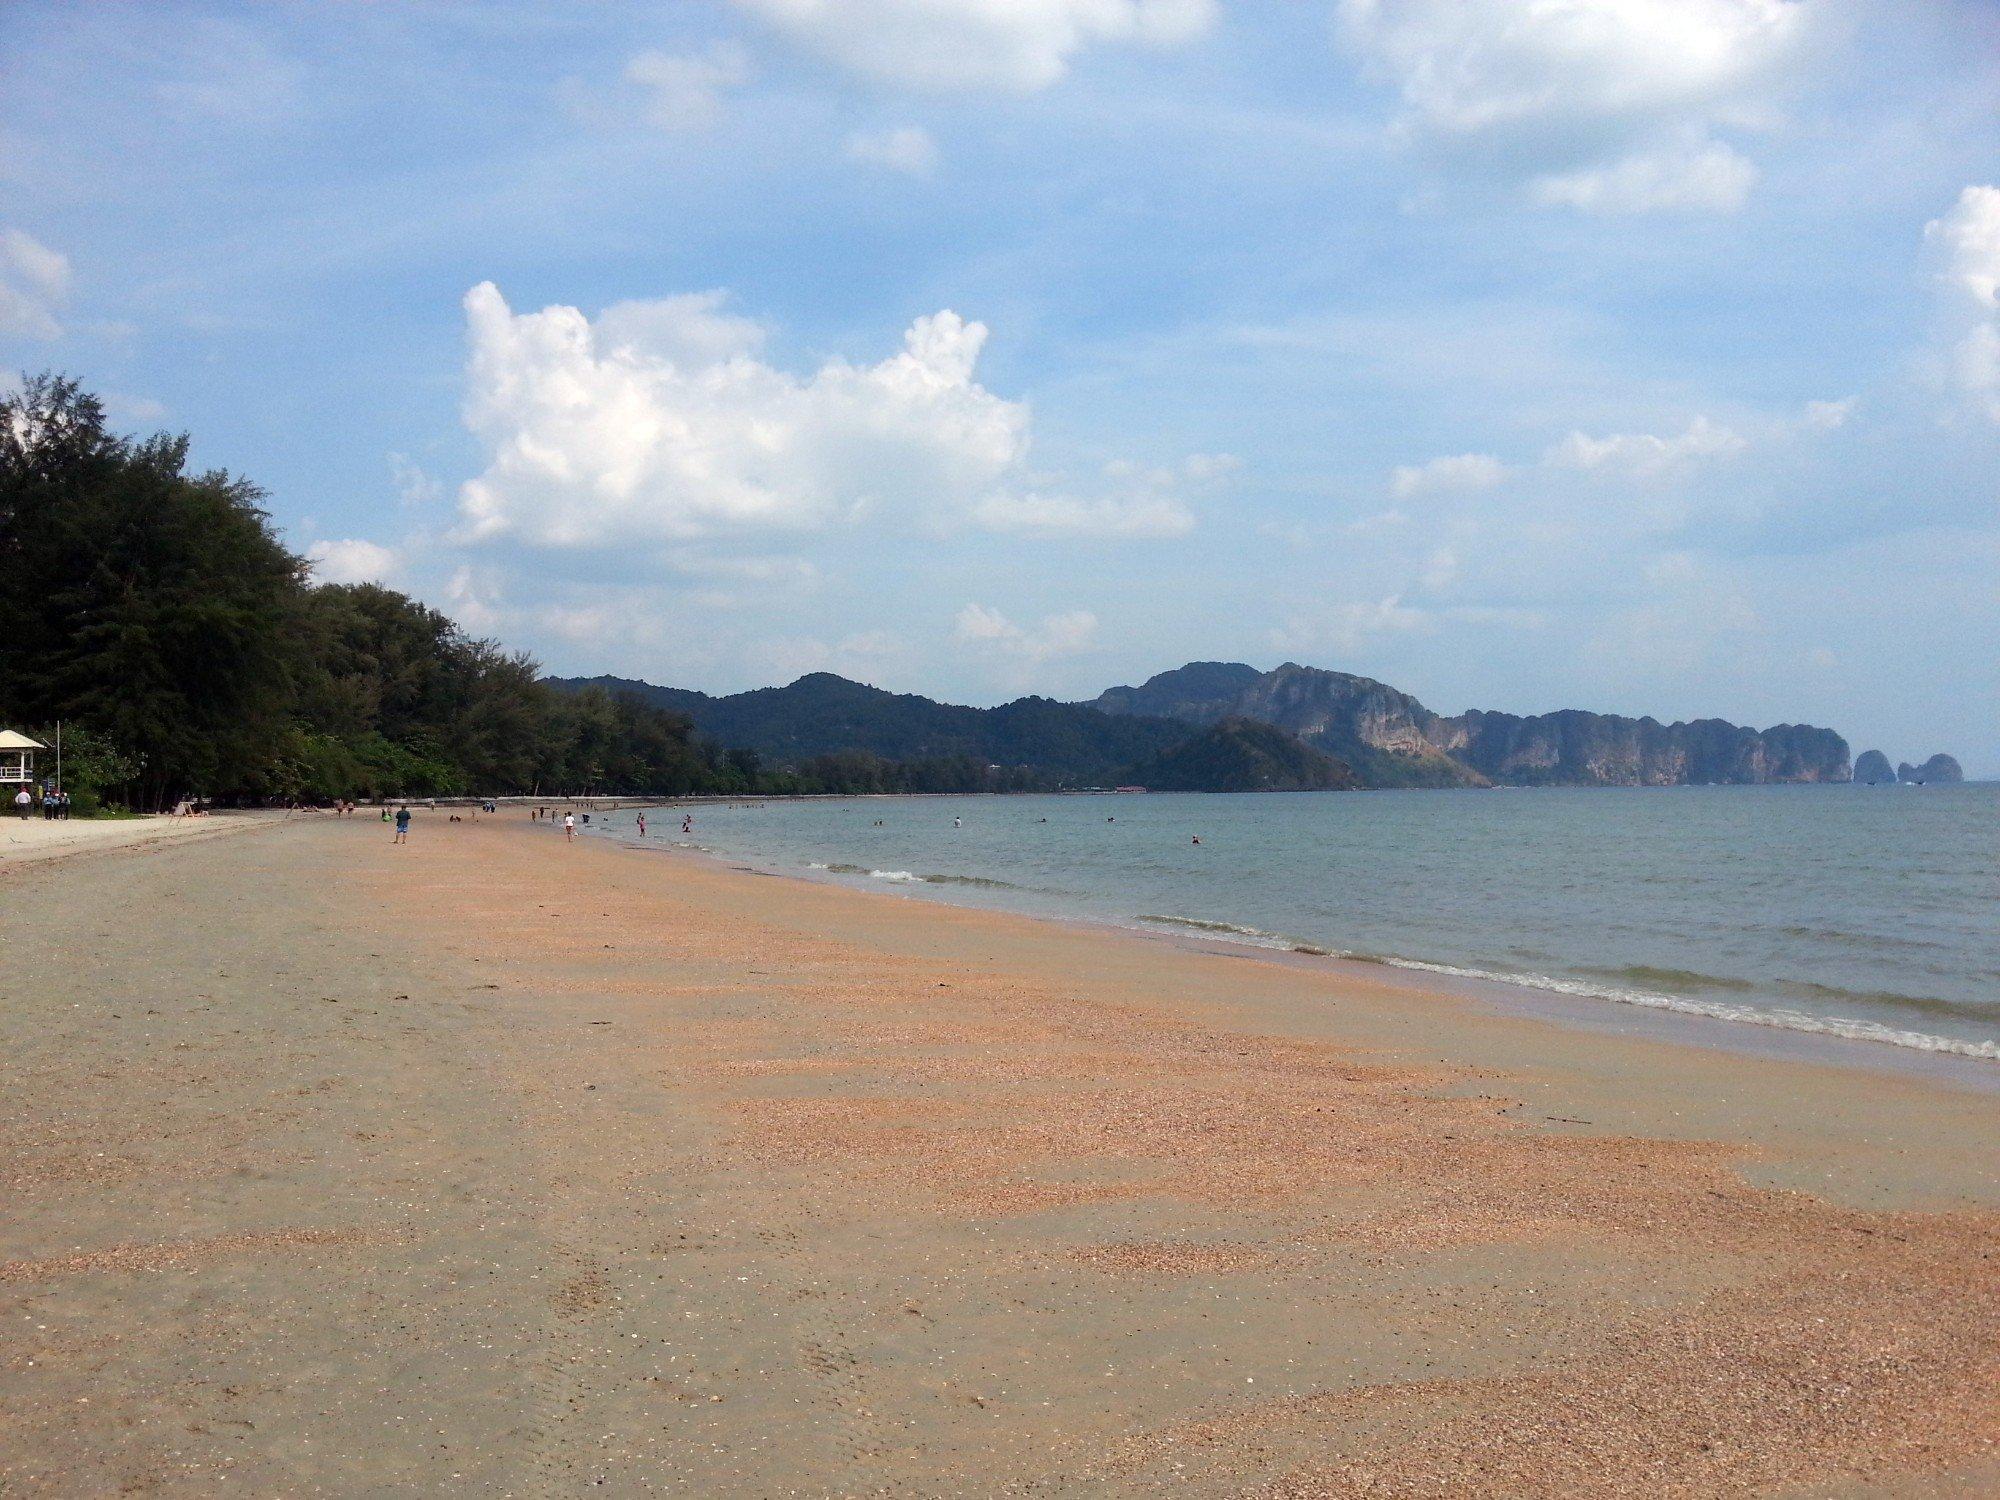 Western end of Noppharat Thara Beach